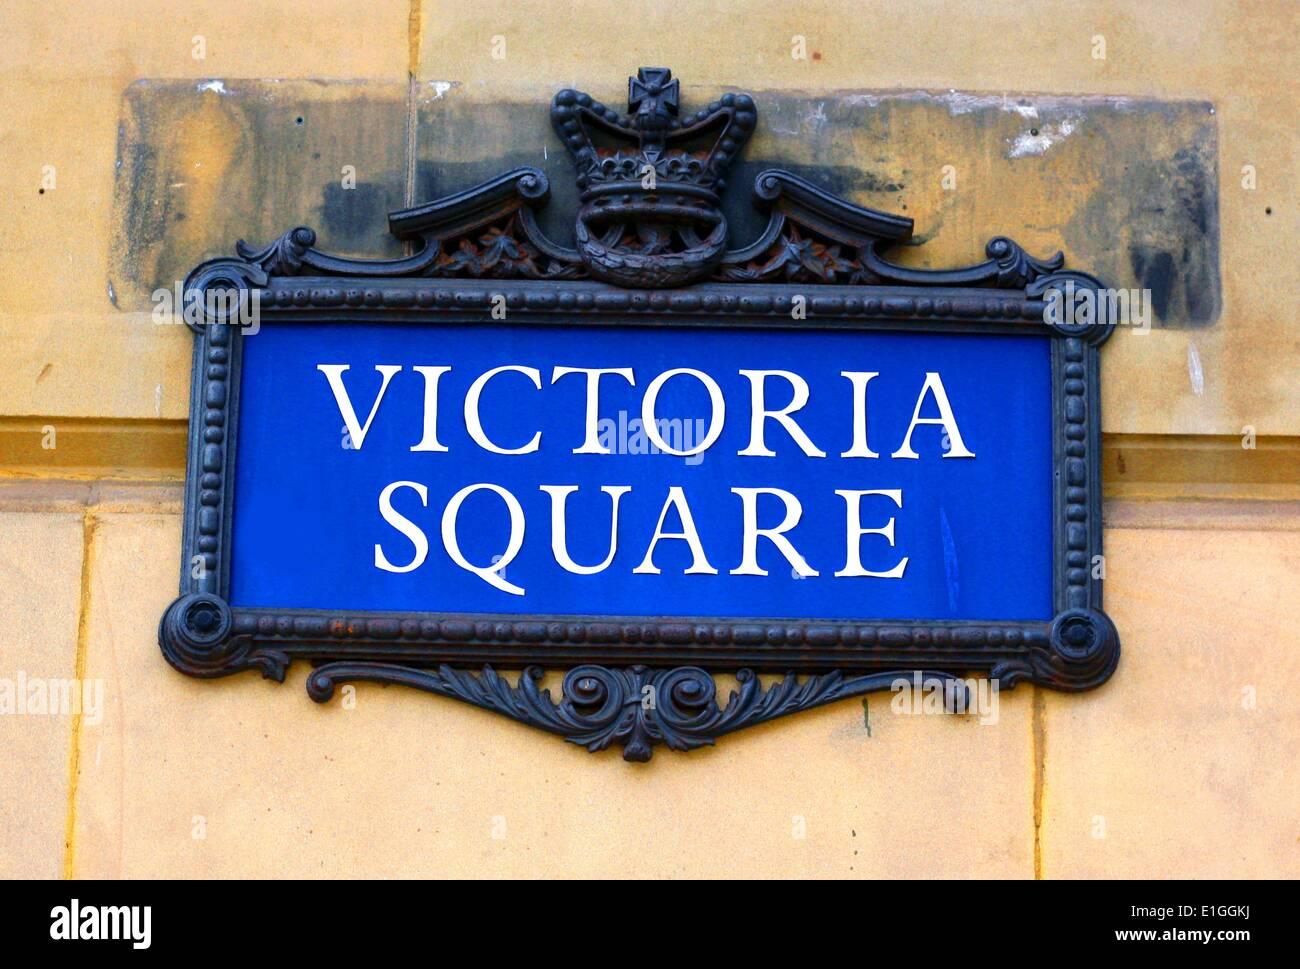 Street sign, Victoria Square Birmingham, England. - Stock Image